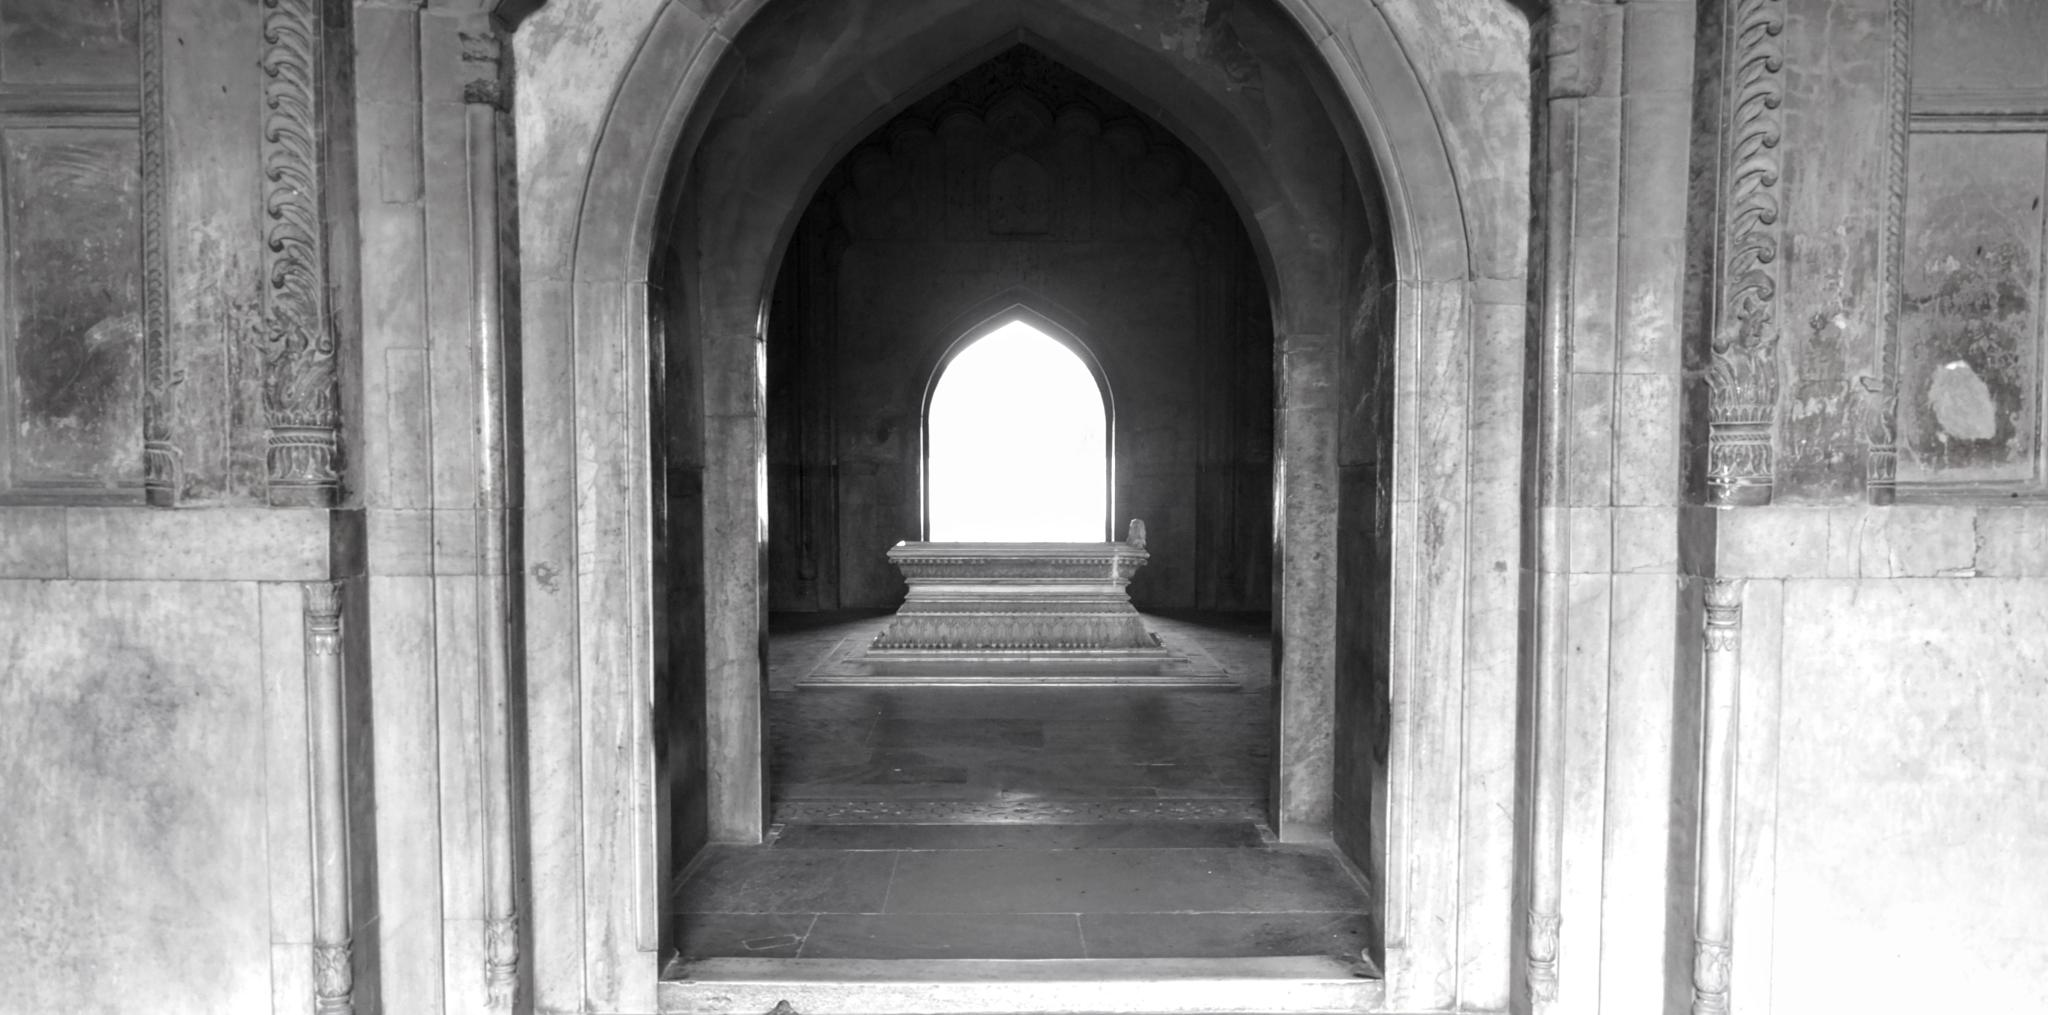 Untitled by mohendra minocha